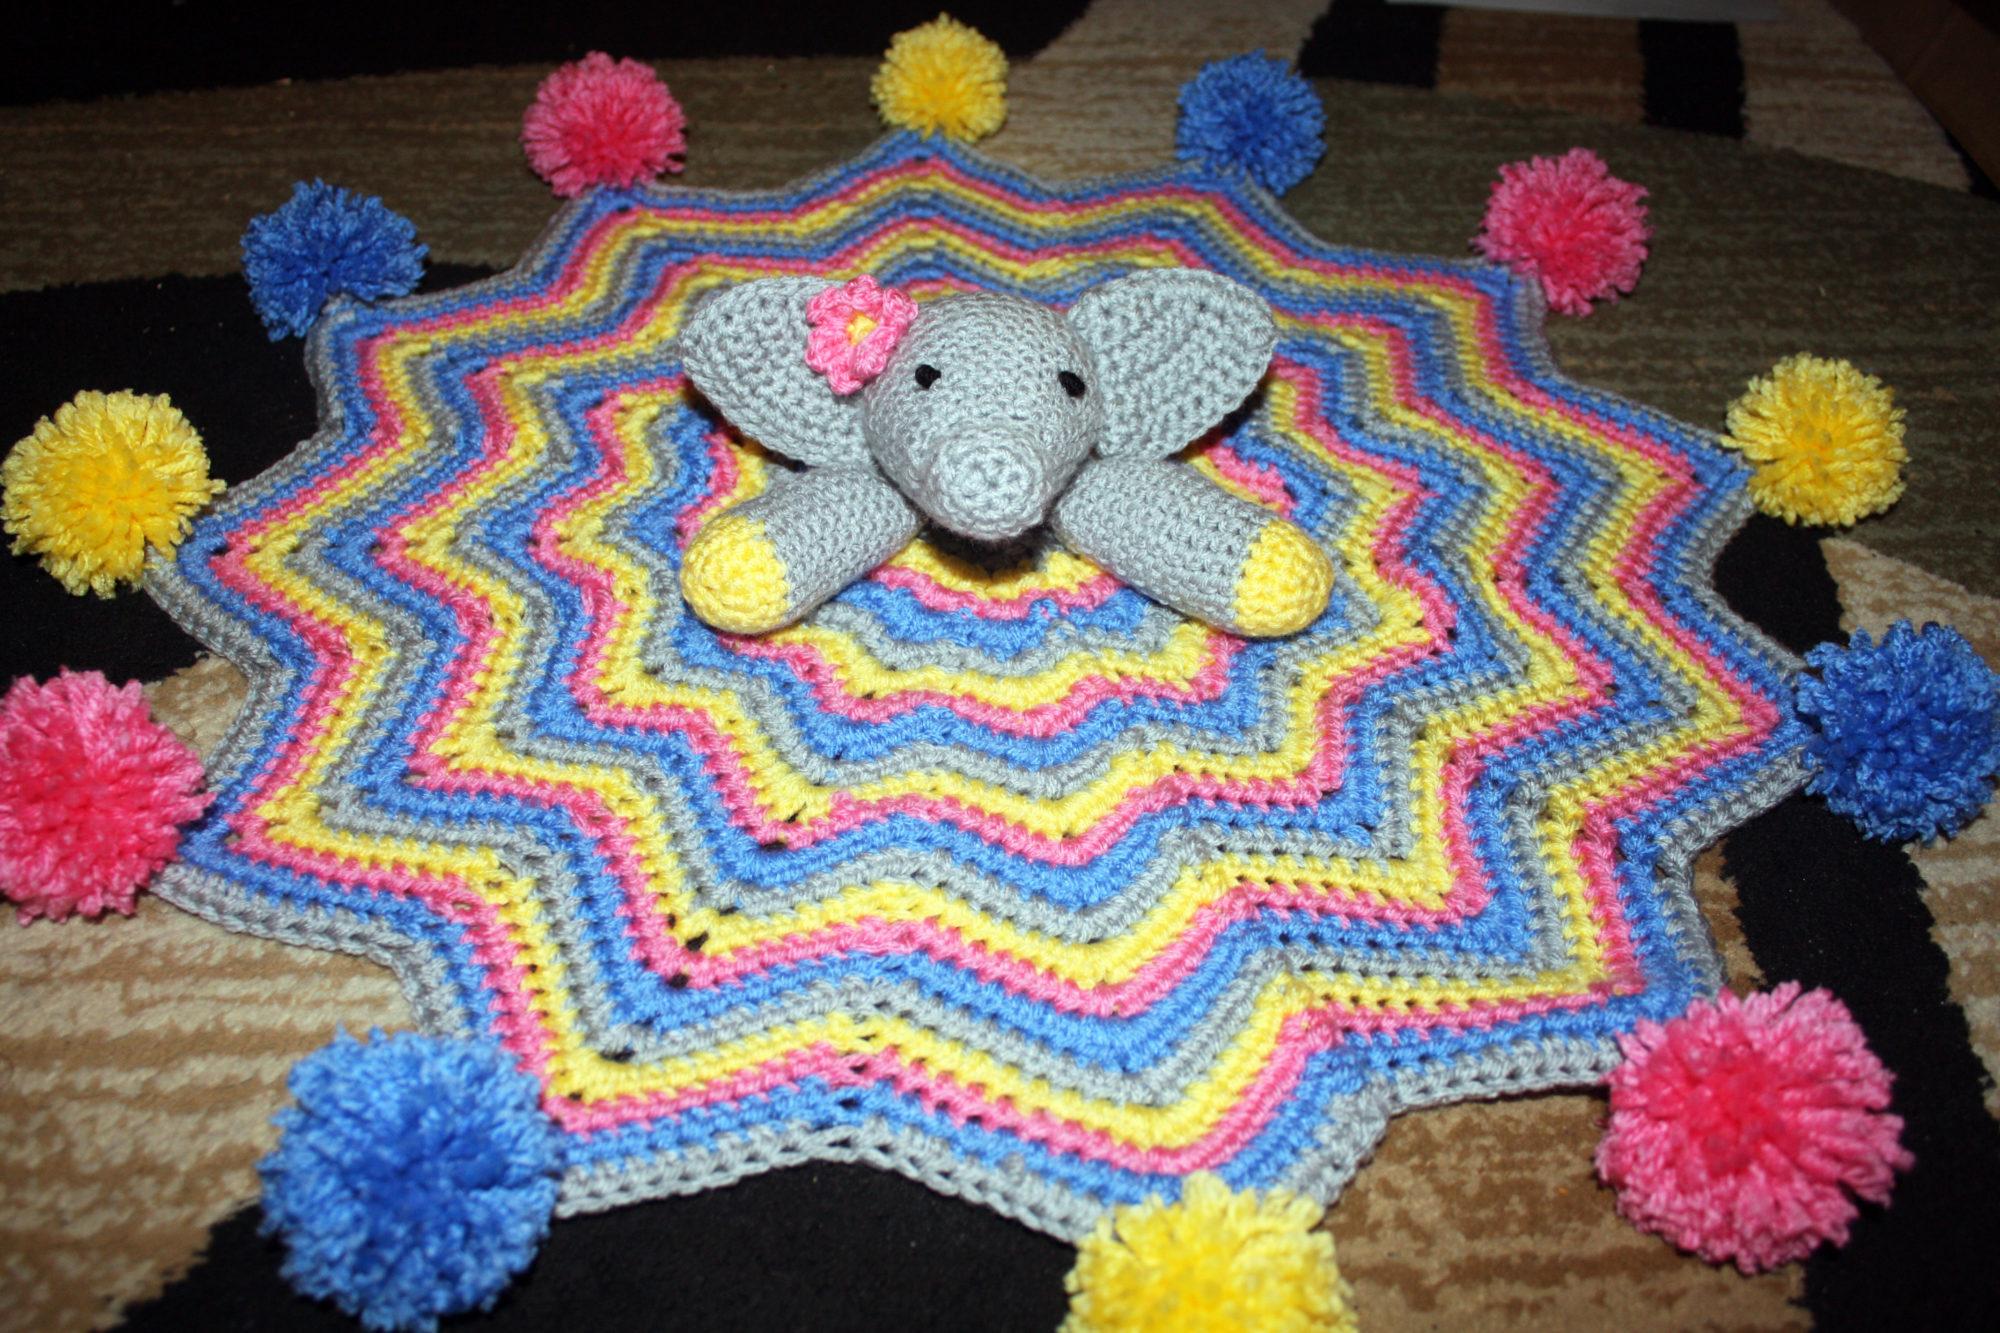 Little Amigurumi Bunny - Free Crochet Pattern - Stella's Yarn Universe | 1333x2000